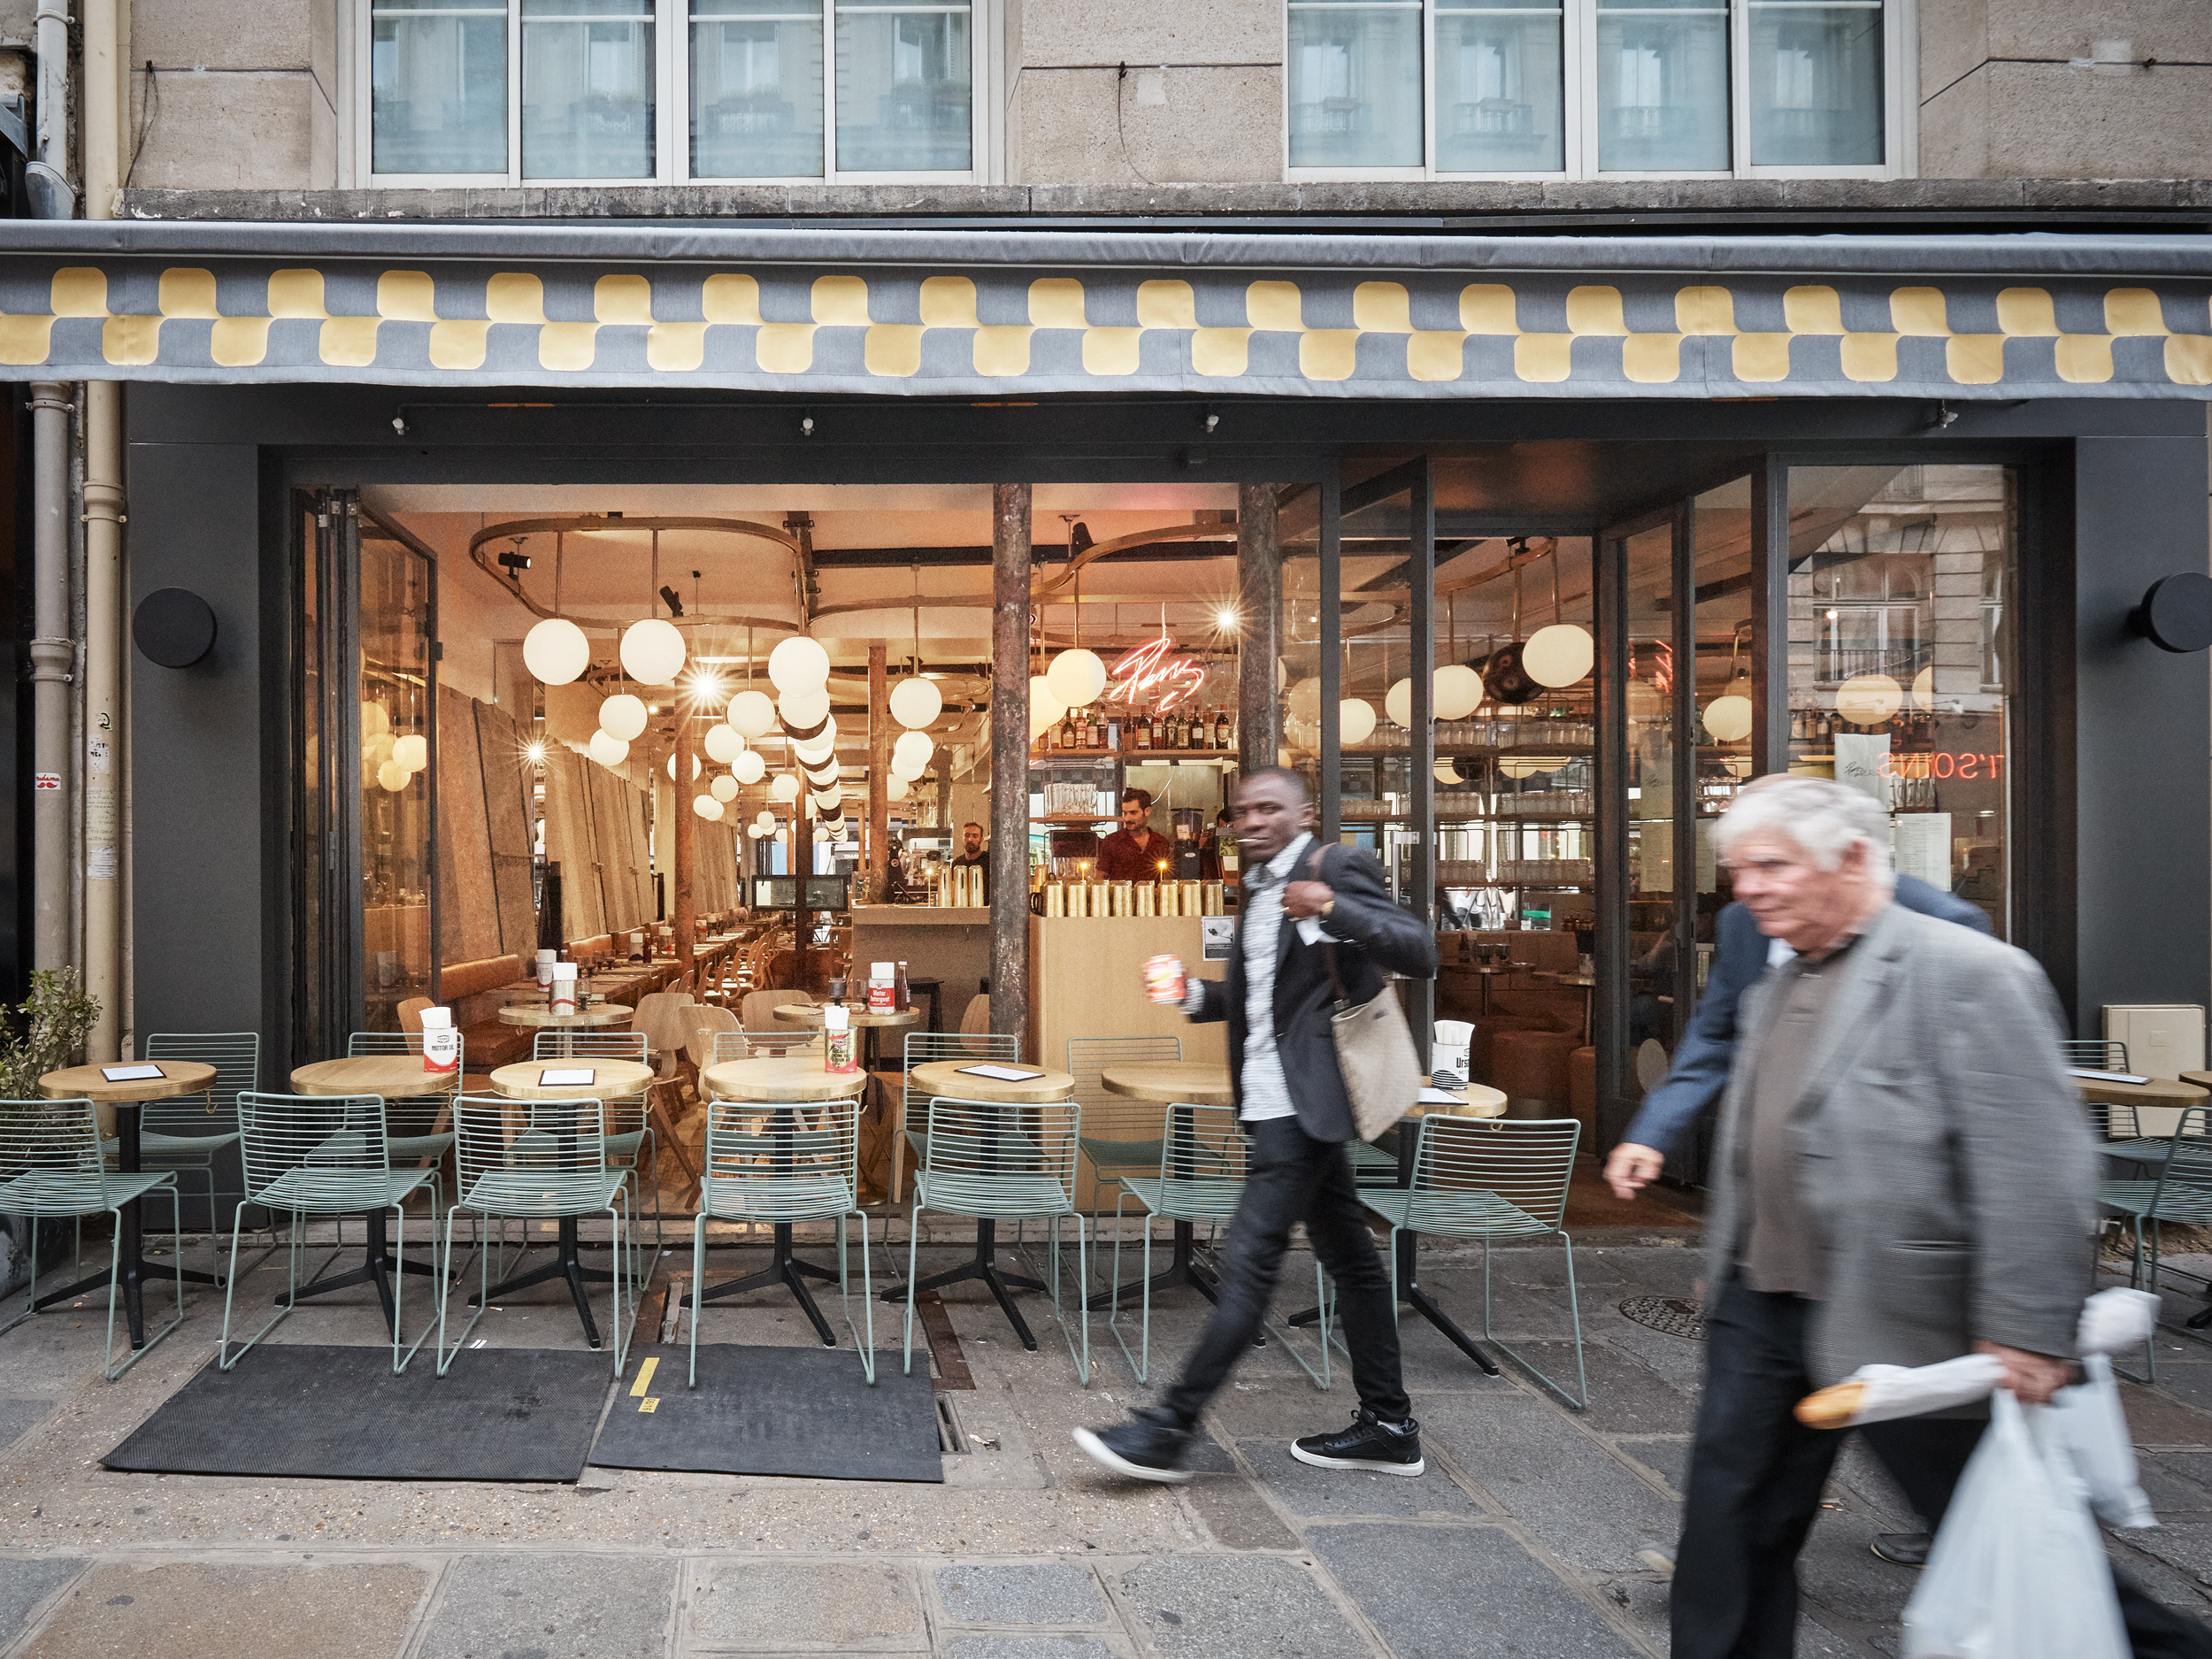 001_CUT Architectures Paris texas © David Foessel.jpg